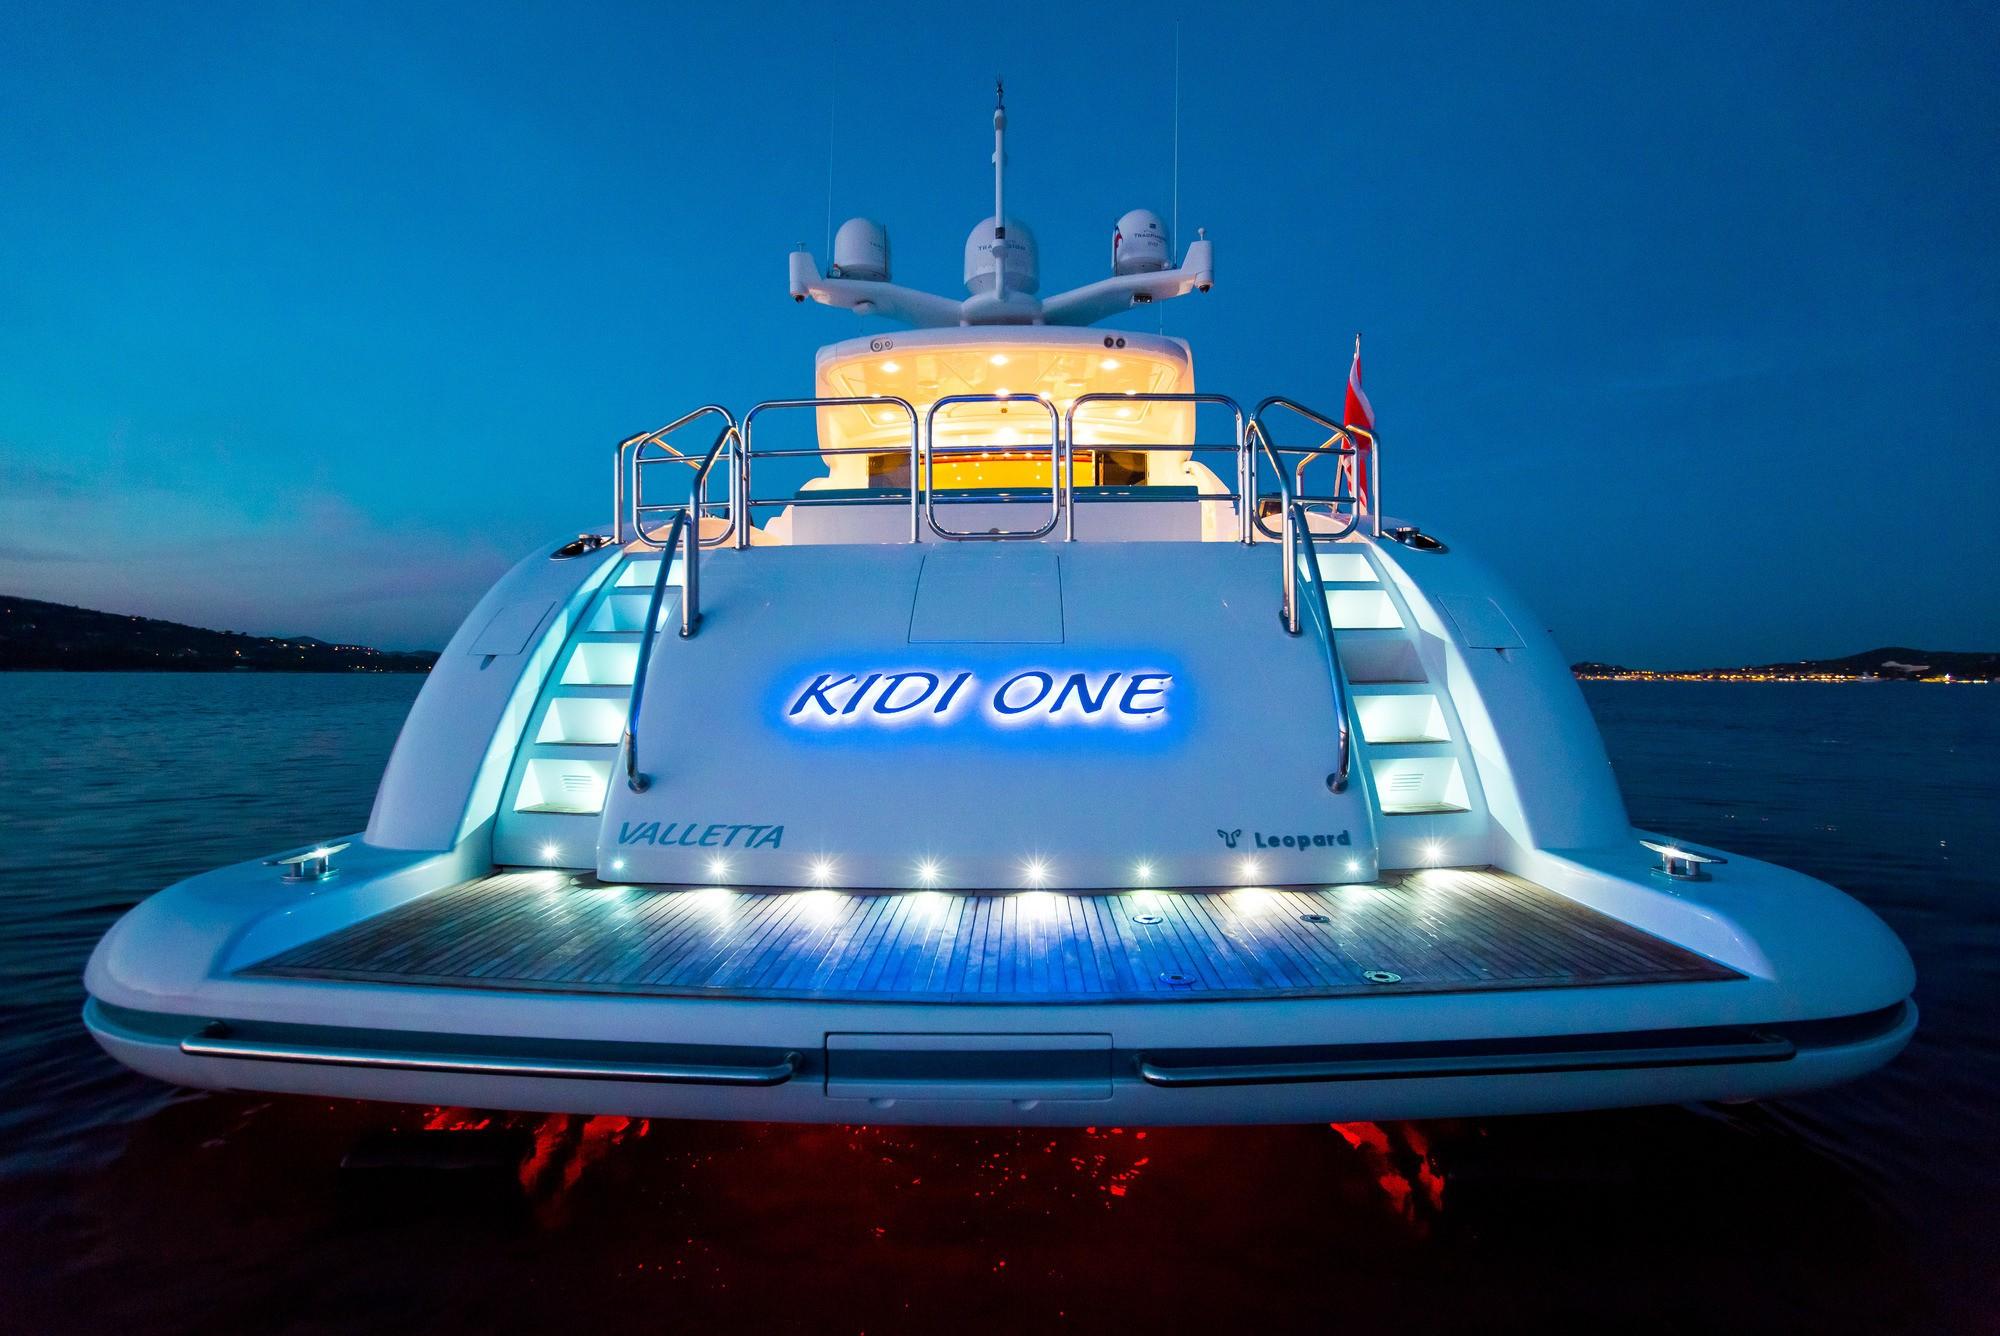 The 34m Yacht KIDI ONE